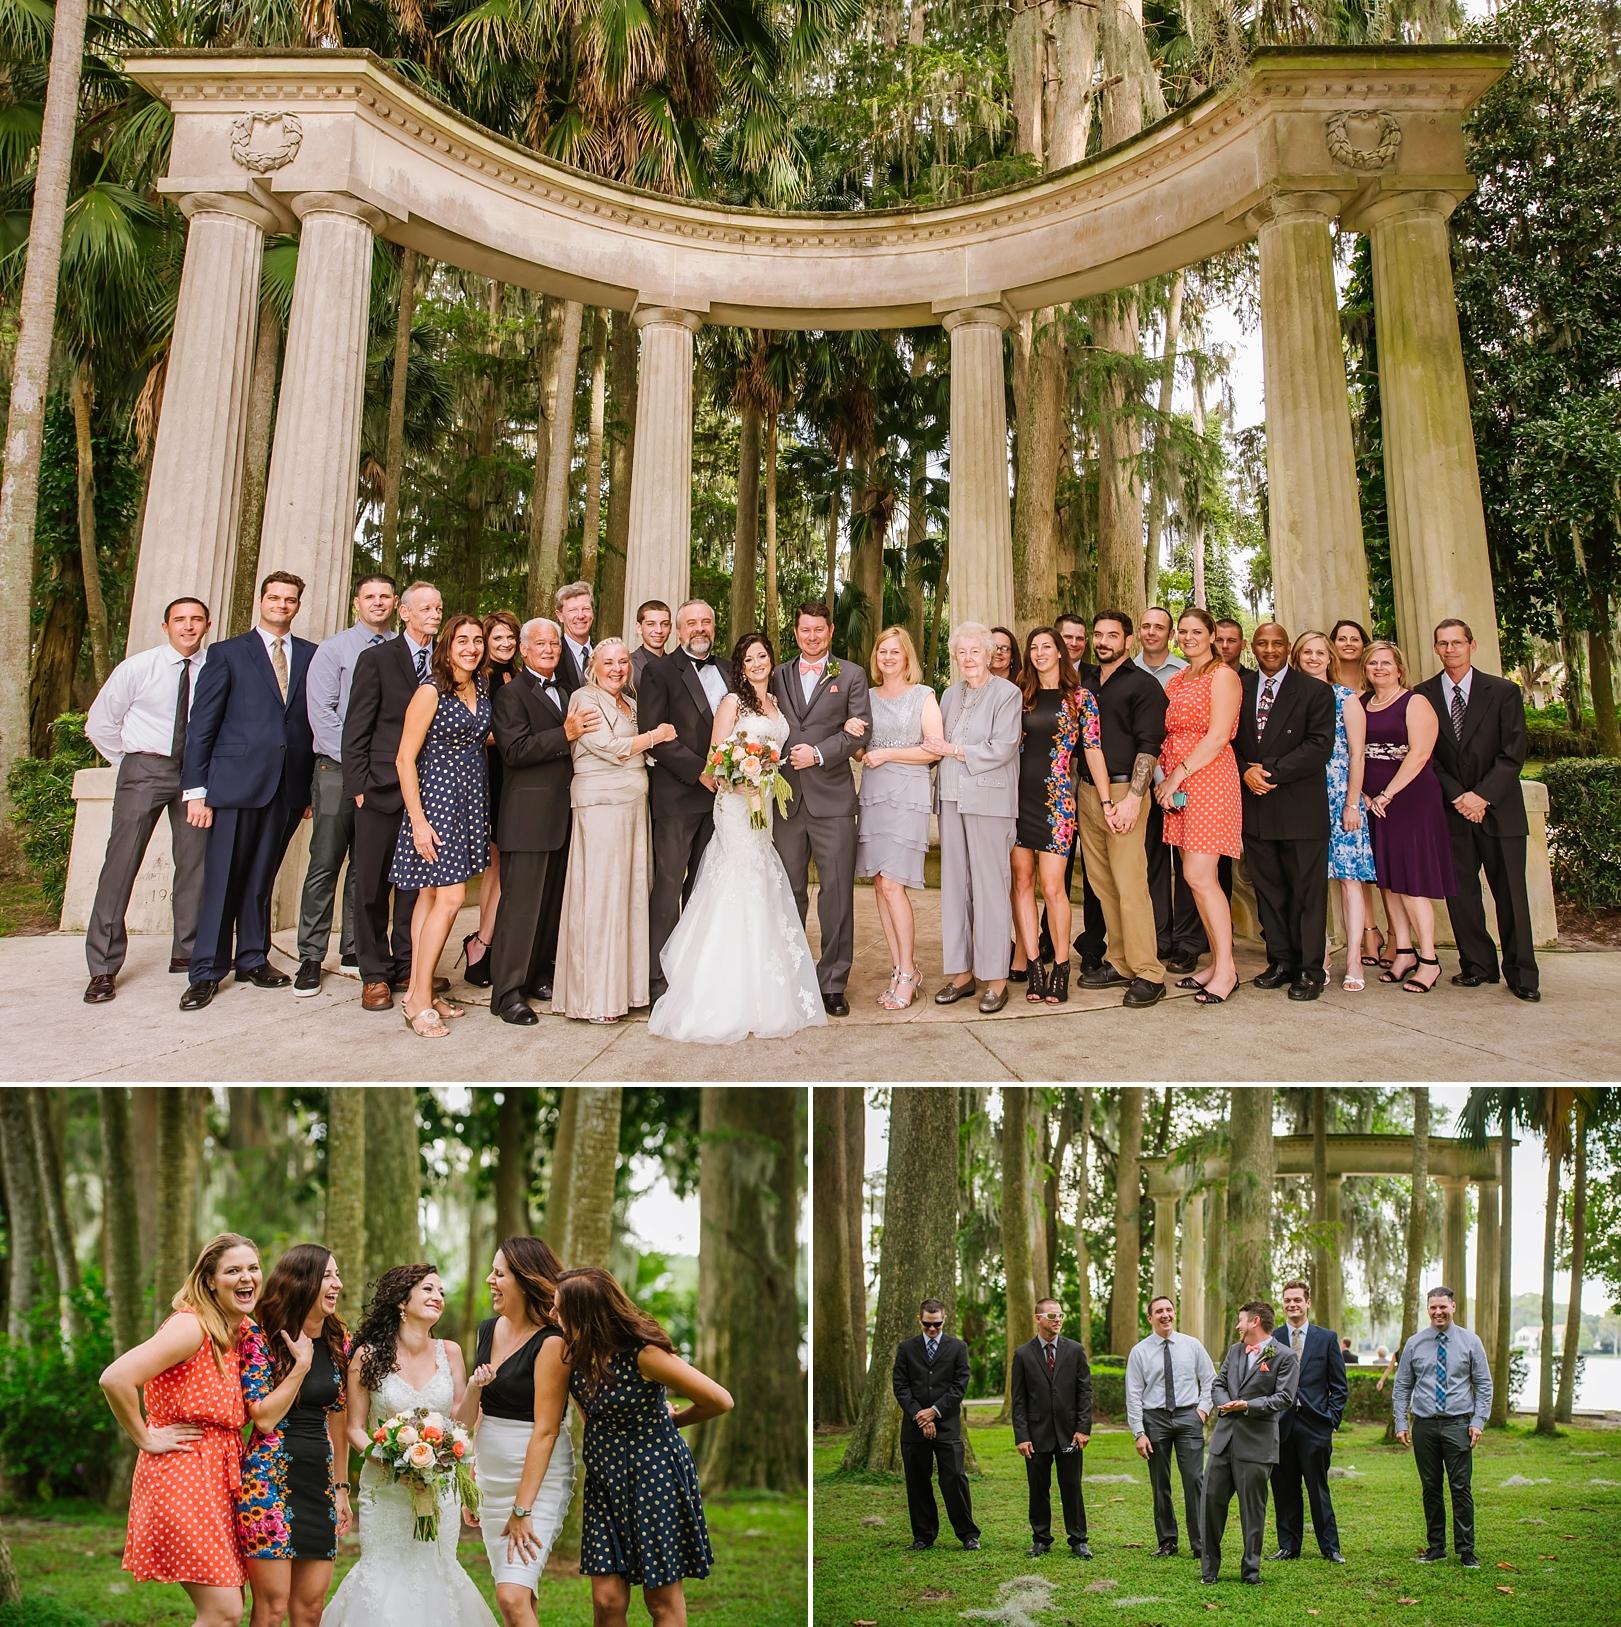 kraft-azalea-gardens-stylish-elopment-wedding-photography_0016.jpg